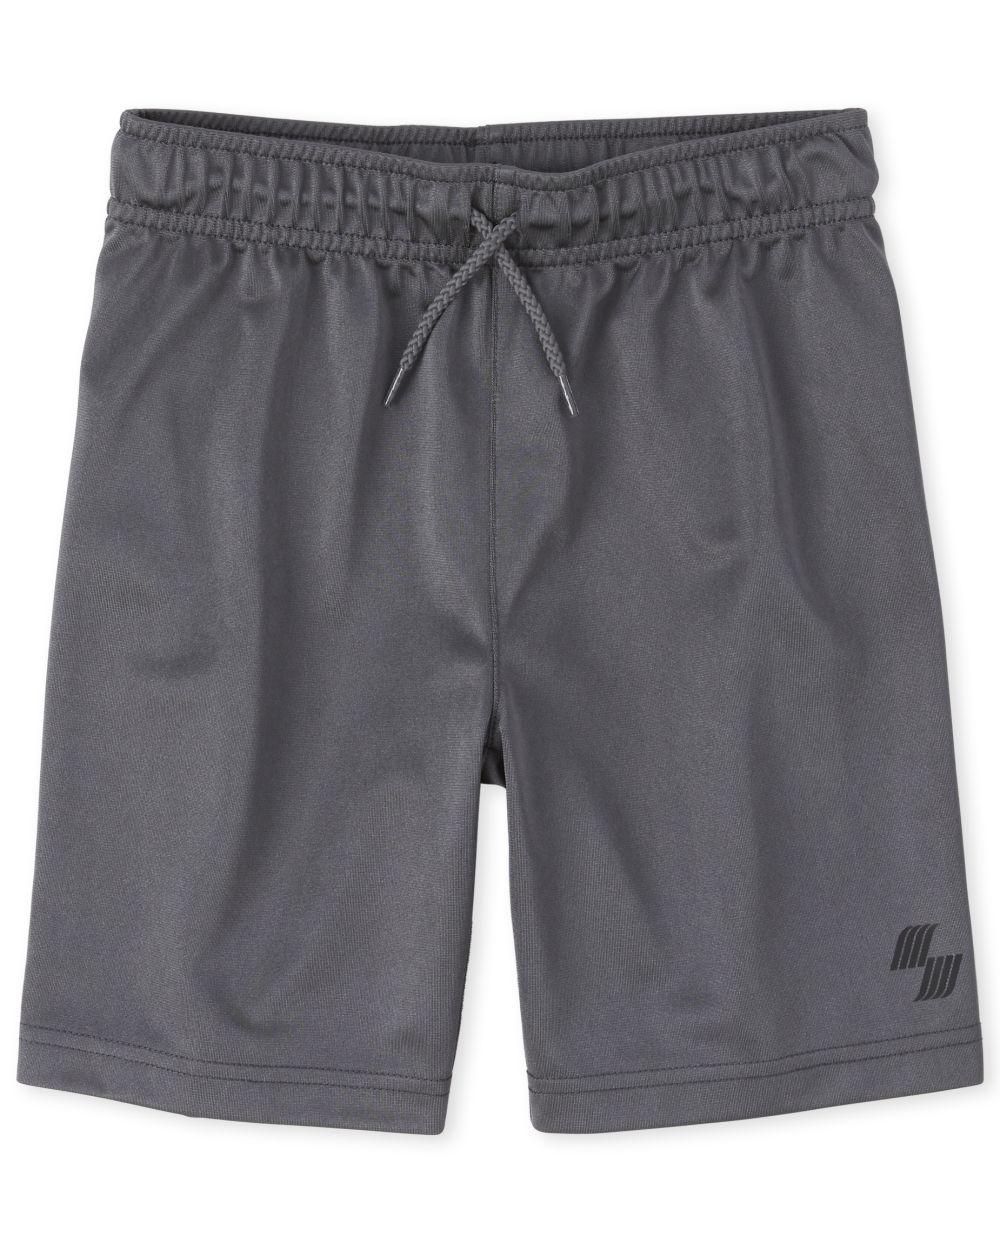 Boys Mix And Match Basketball Shorts